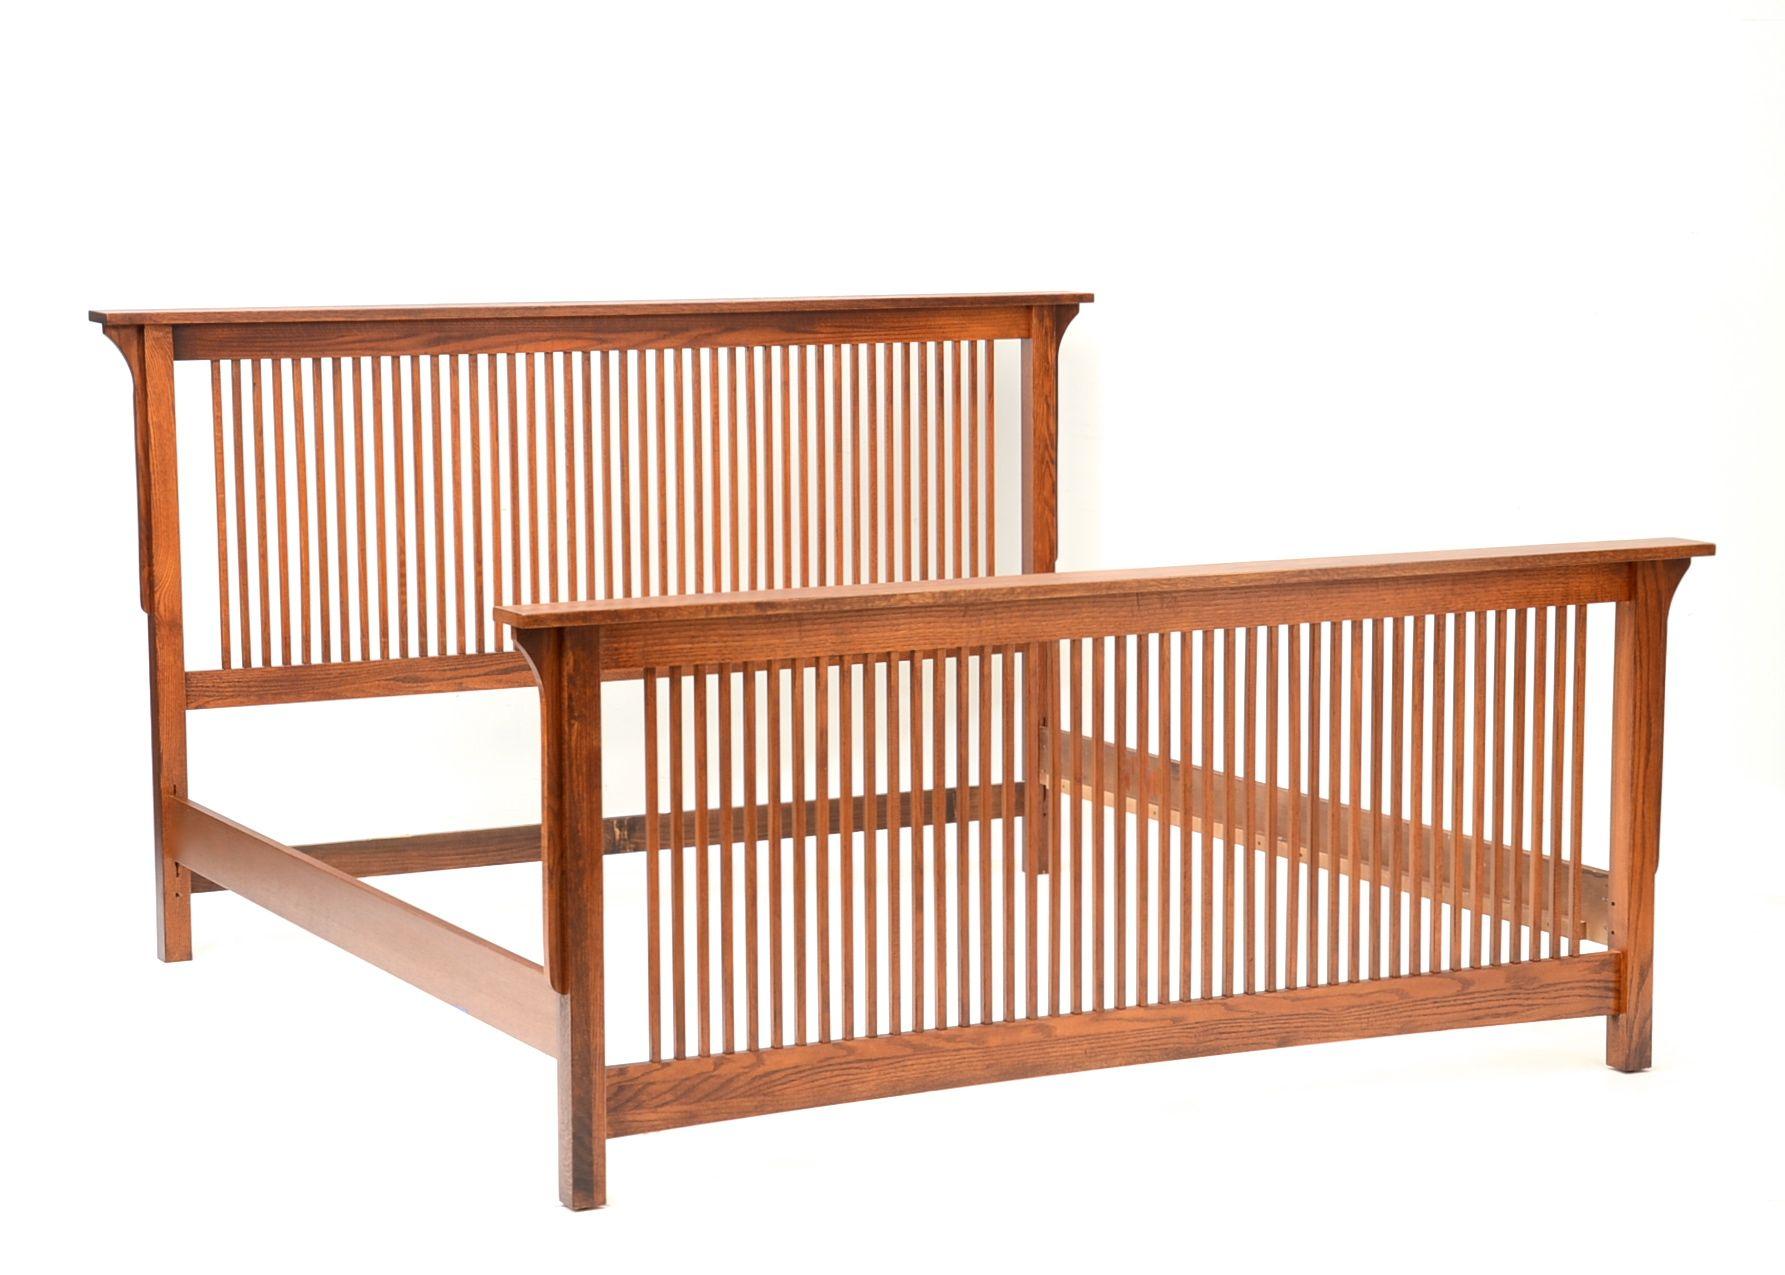 Mission Style KingSized Bed Frame in Oak EBTH